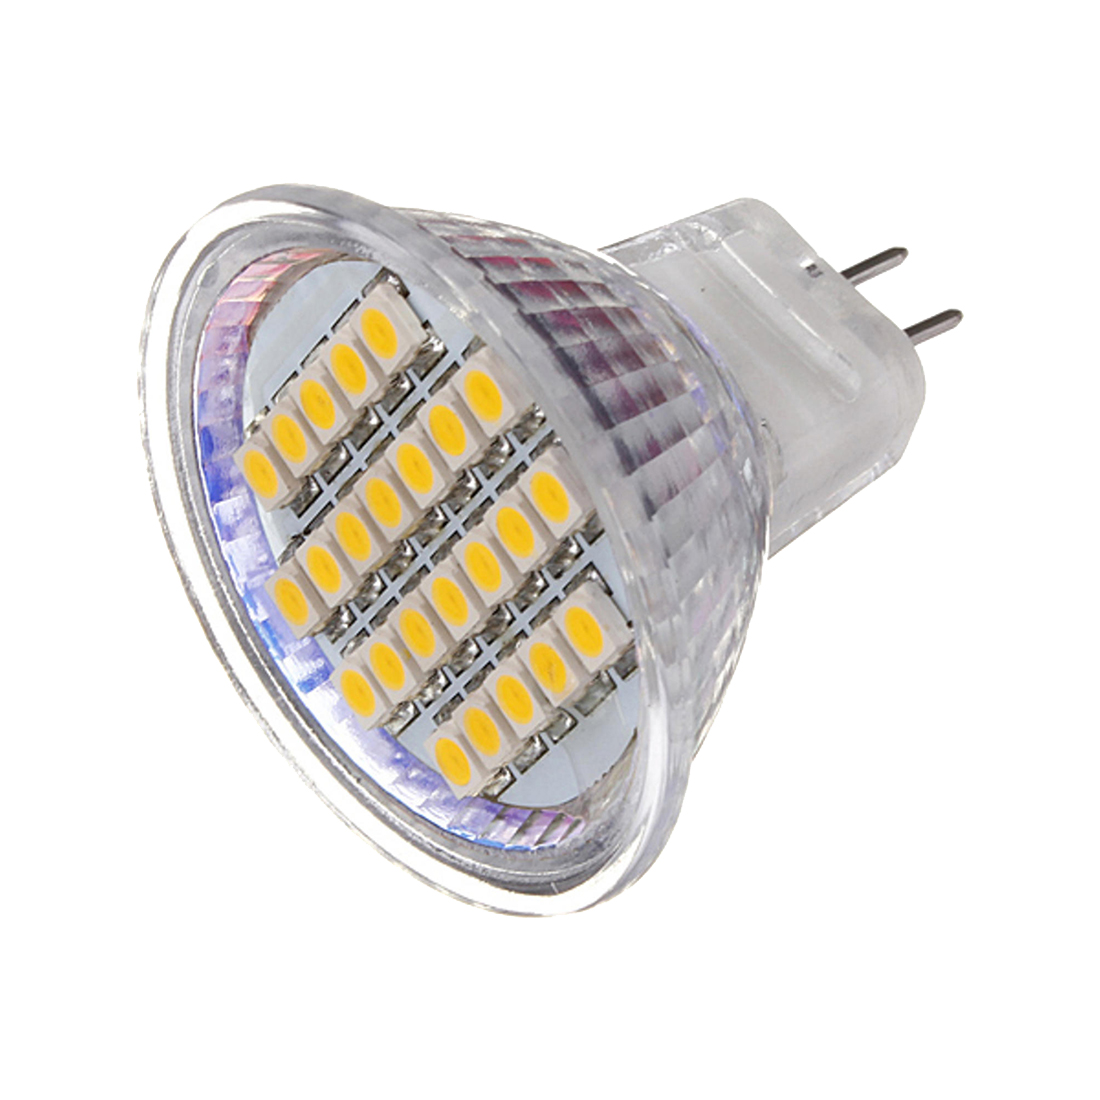 MR11 LED Light 24SMD Bulb Lamp AC&DC 12V Type:MR11 24Smd 3528 Light Color:Pure White Pack of:5X